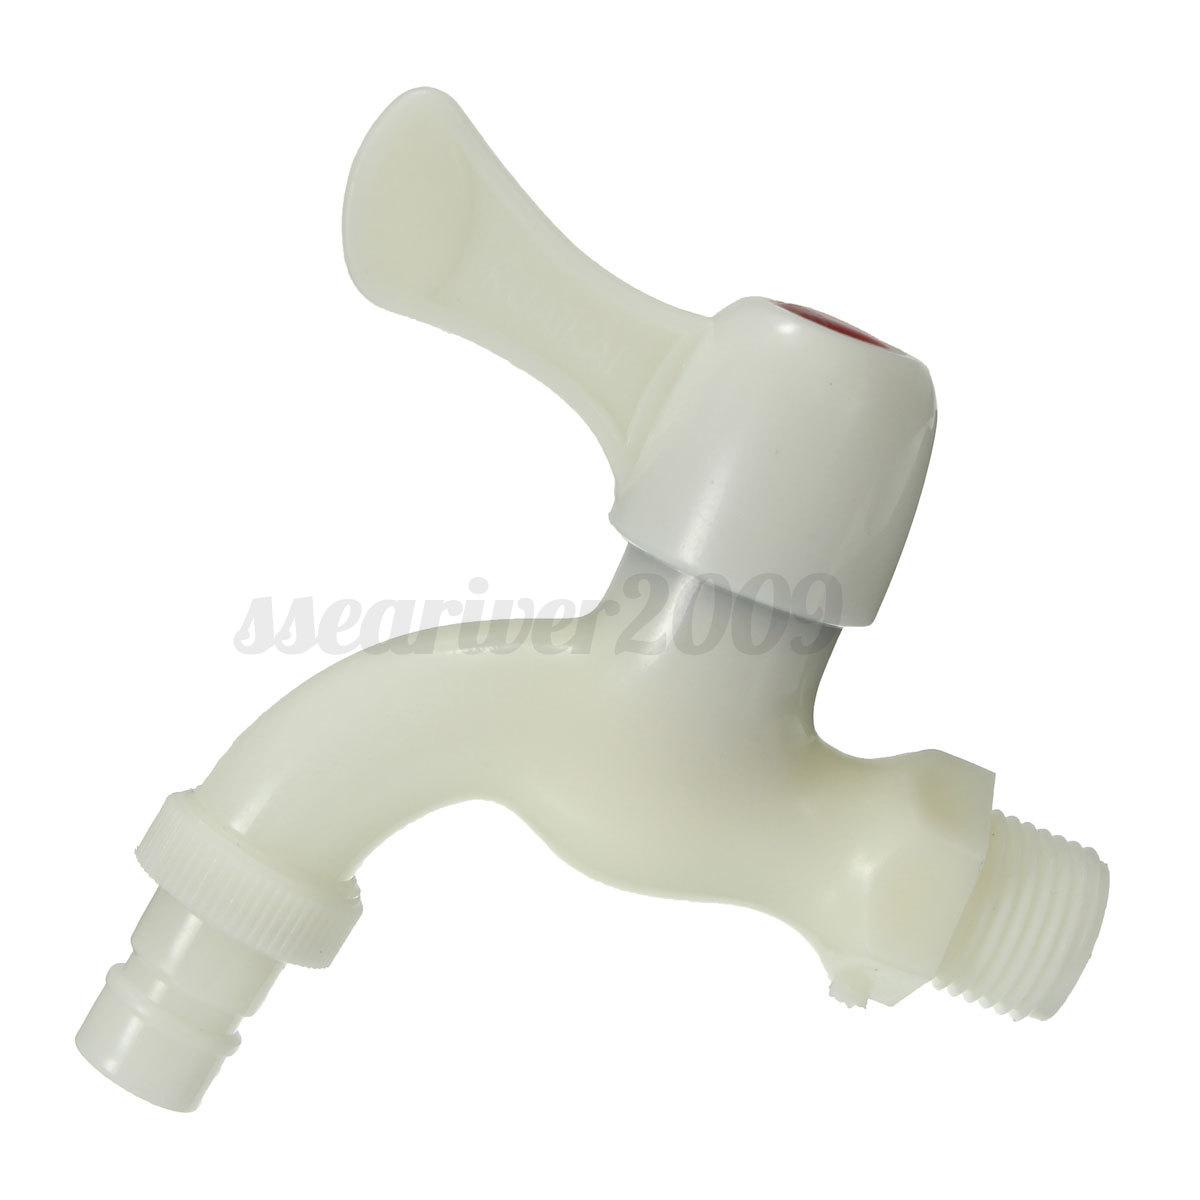 Kitchen Sink Outlet: Home Garden Kitchen Sink Basin Outlet Plastic White Thread